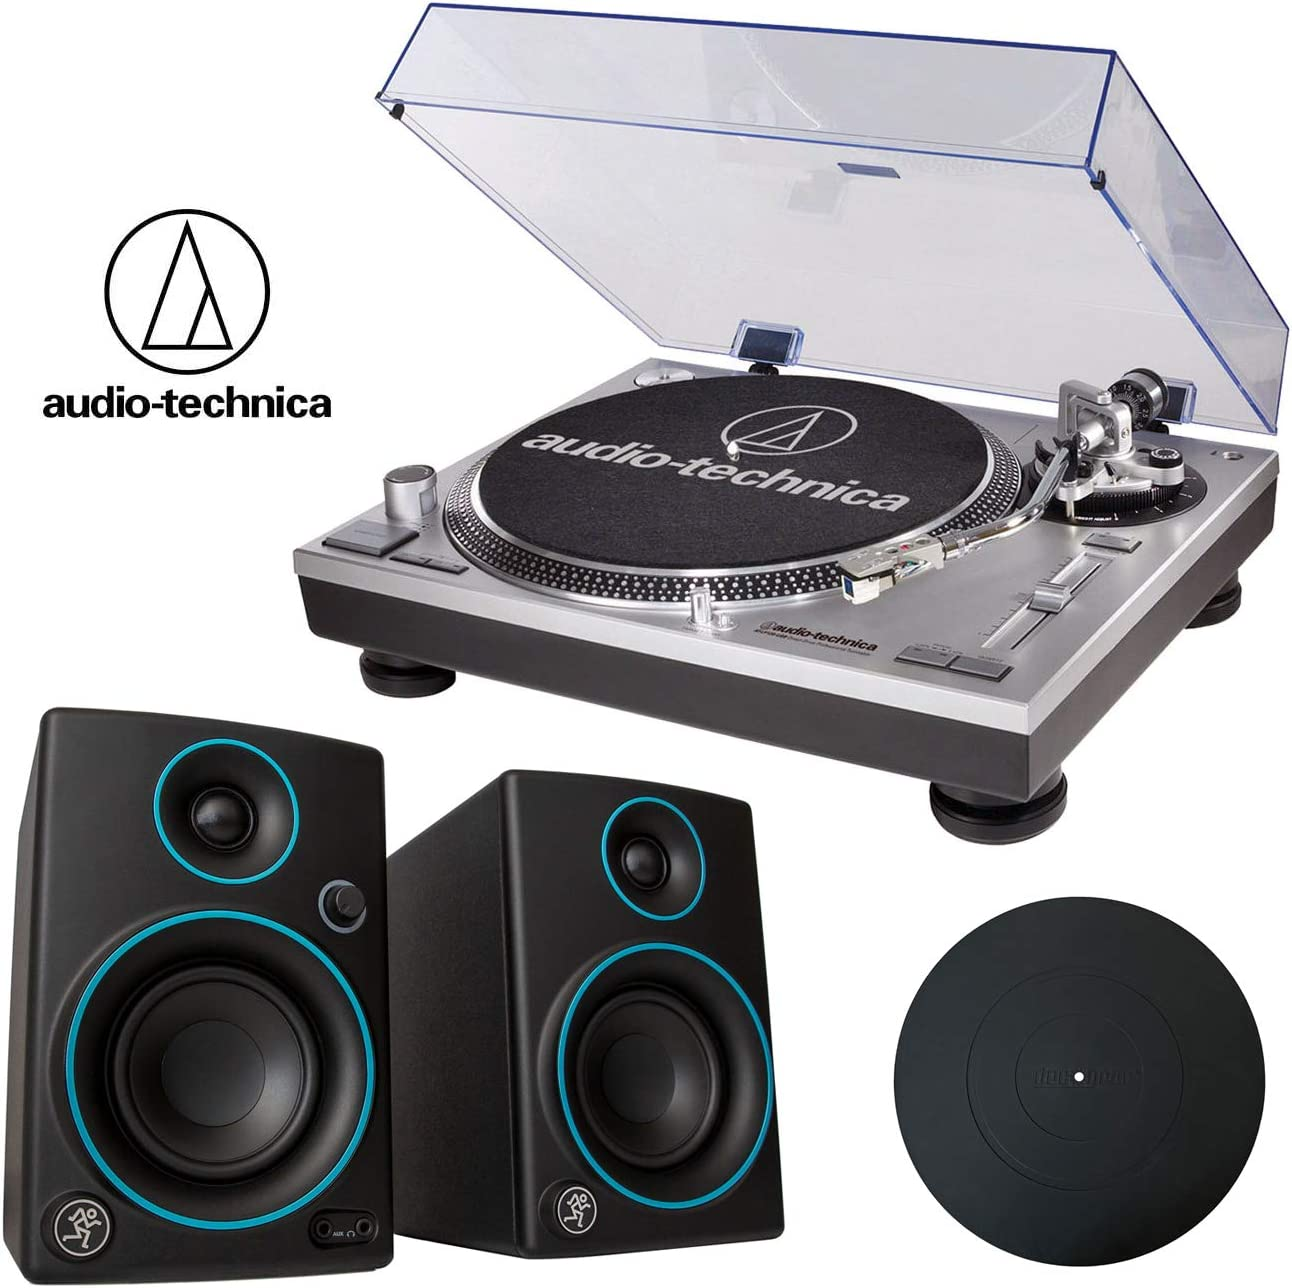 Amazon.com: Audio-Technica ATLP120USB - Tocadiscos estéreo ...